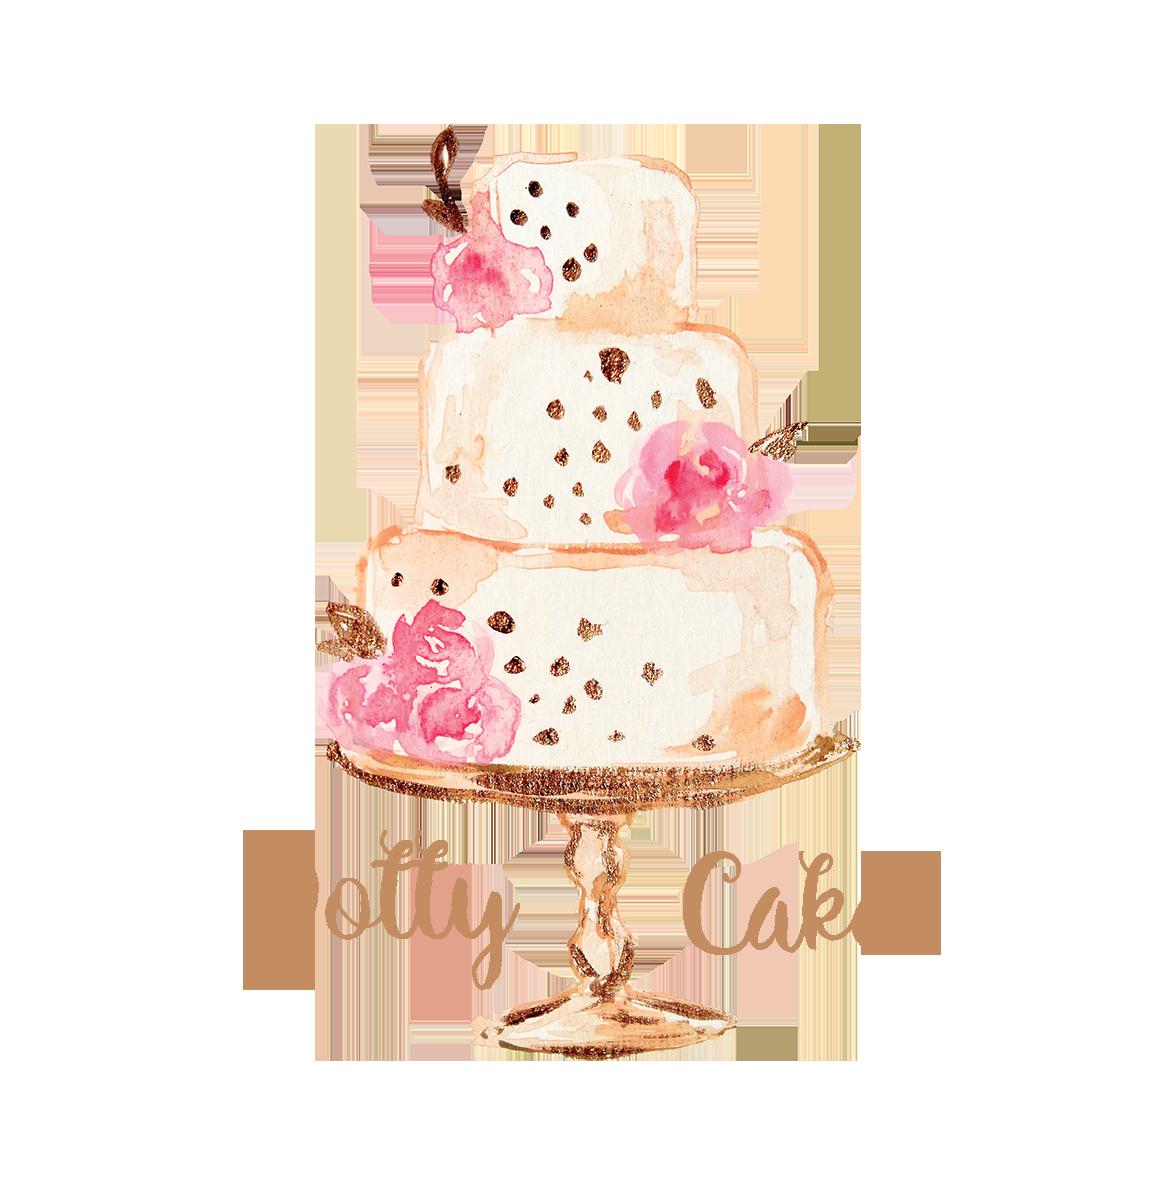 Cake Design Png : Logo Designer Southampton - Website Design Southampton ...